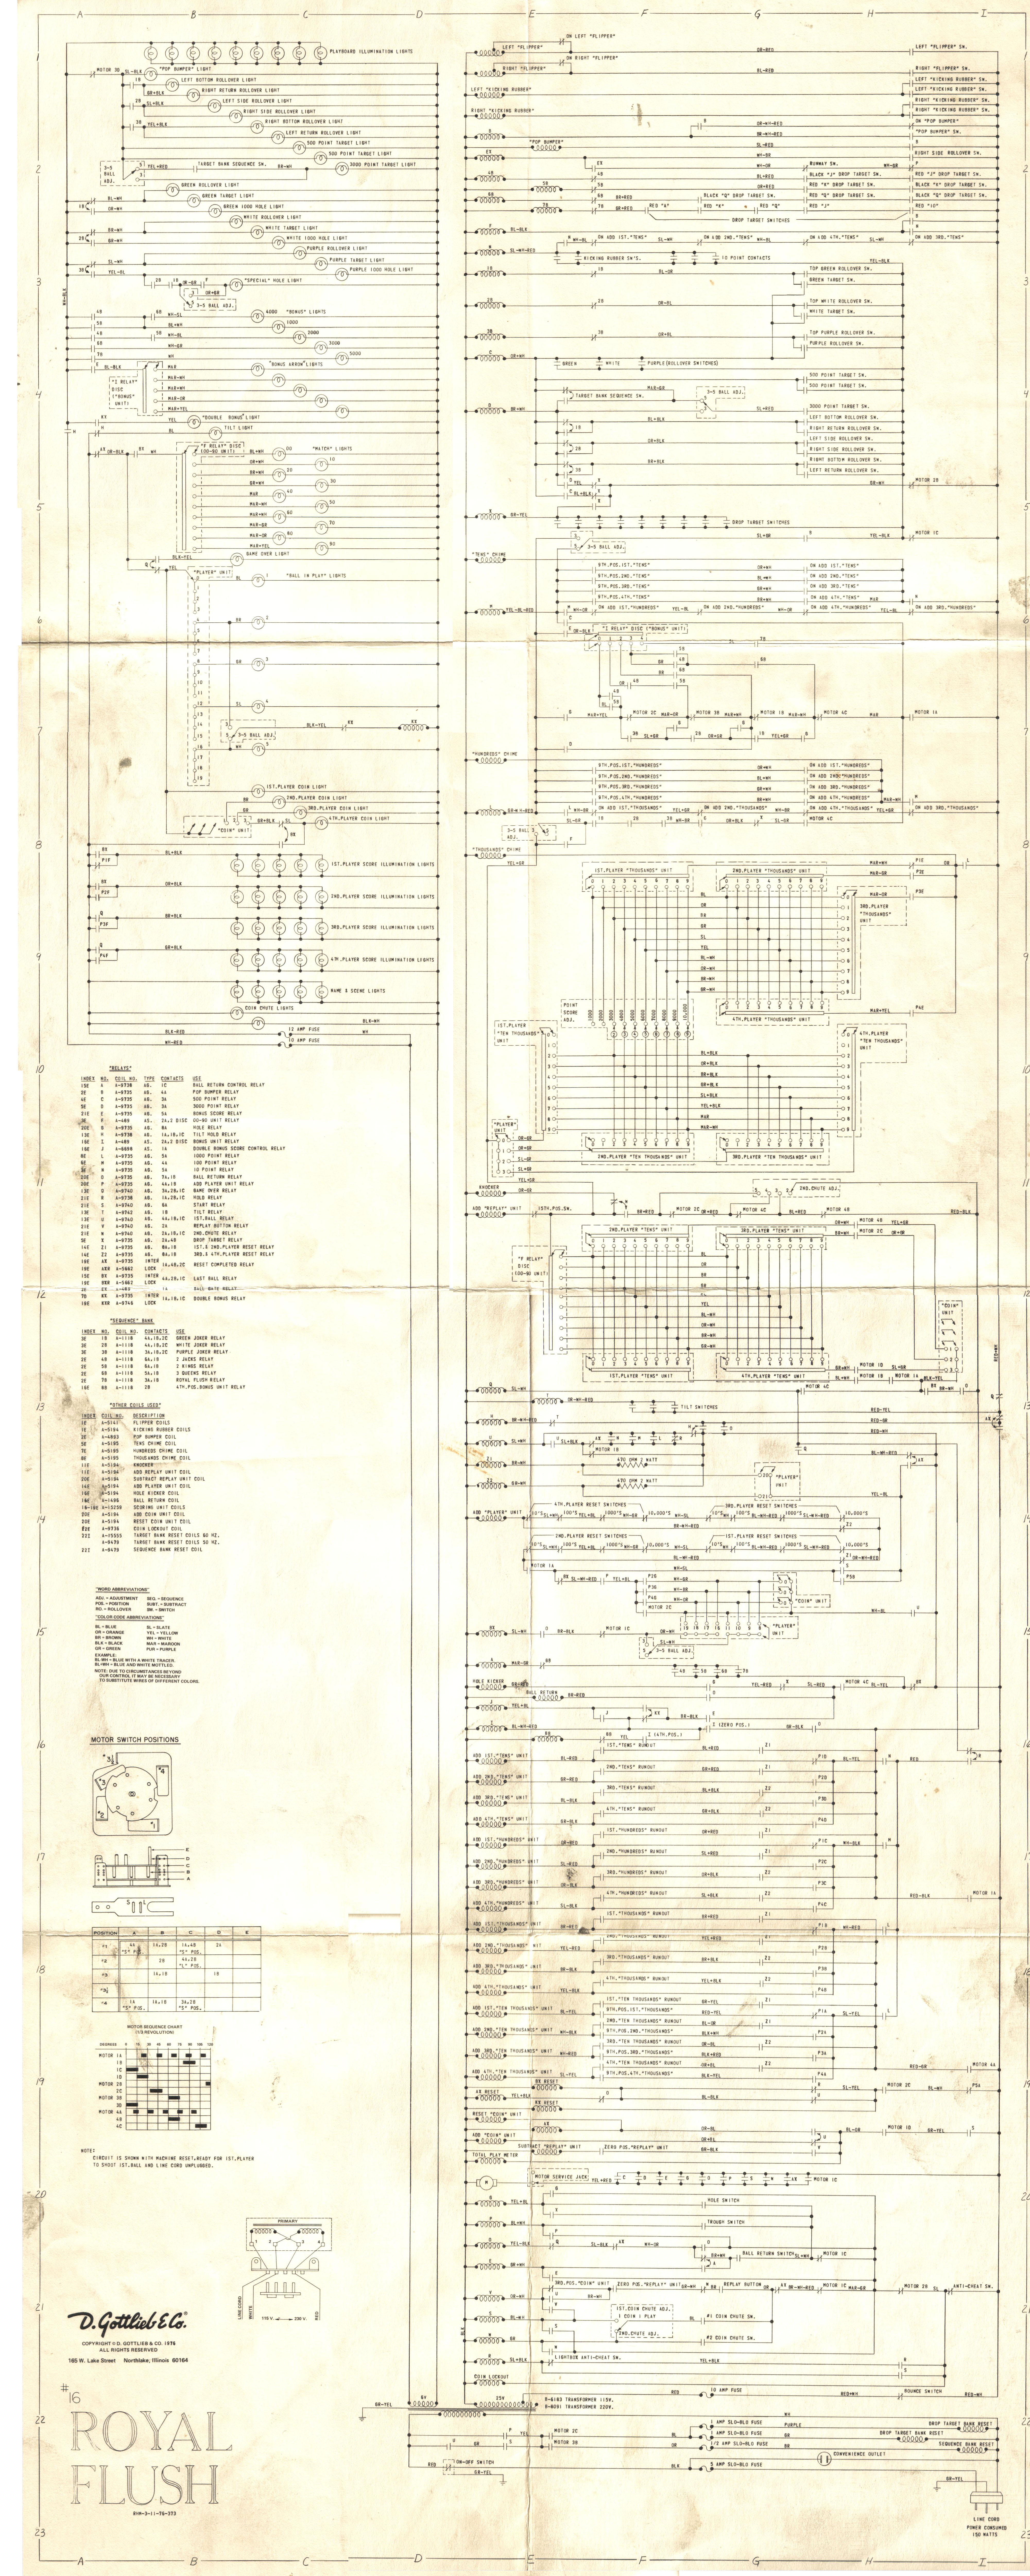 Royal Flush Pinball Wiring Diagram And Schematics Diagrams Http Thetastates Com Rfschematics